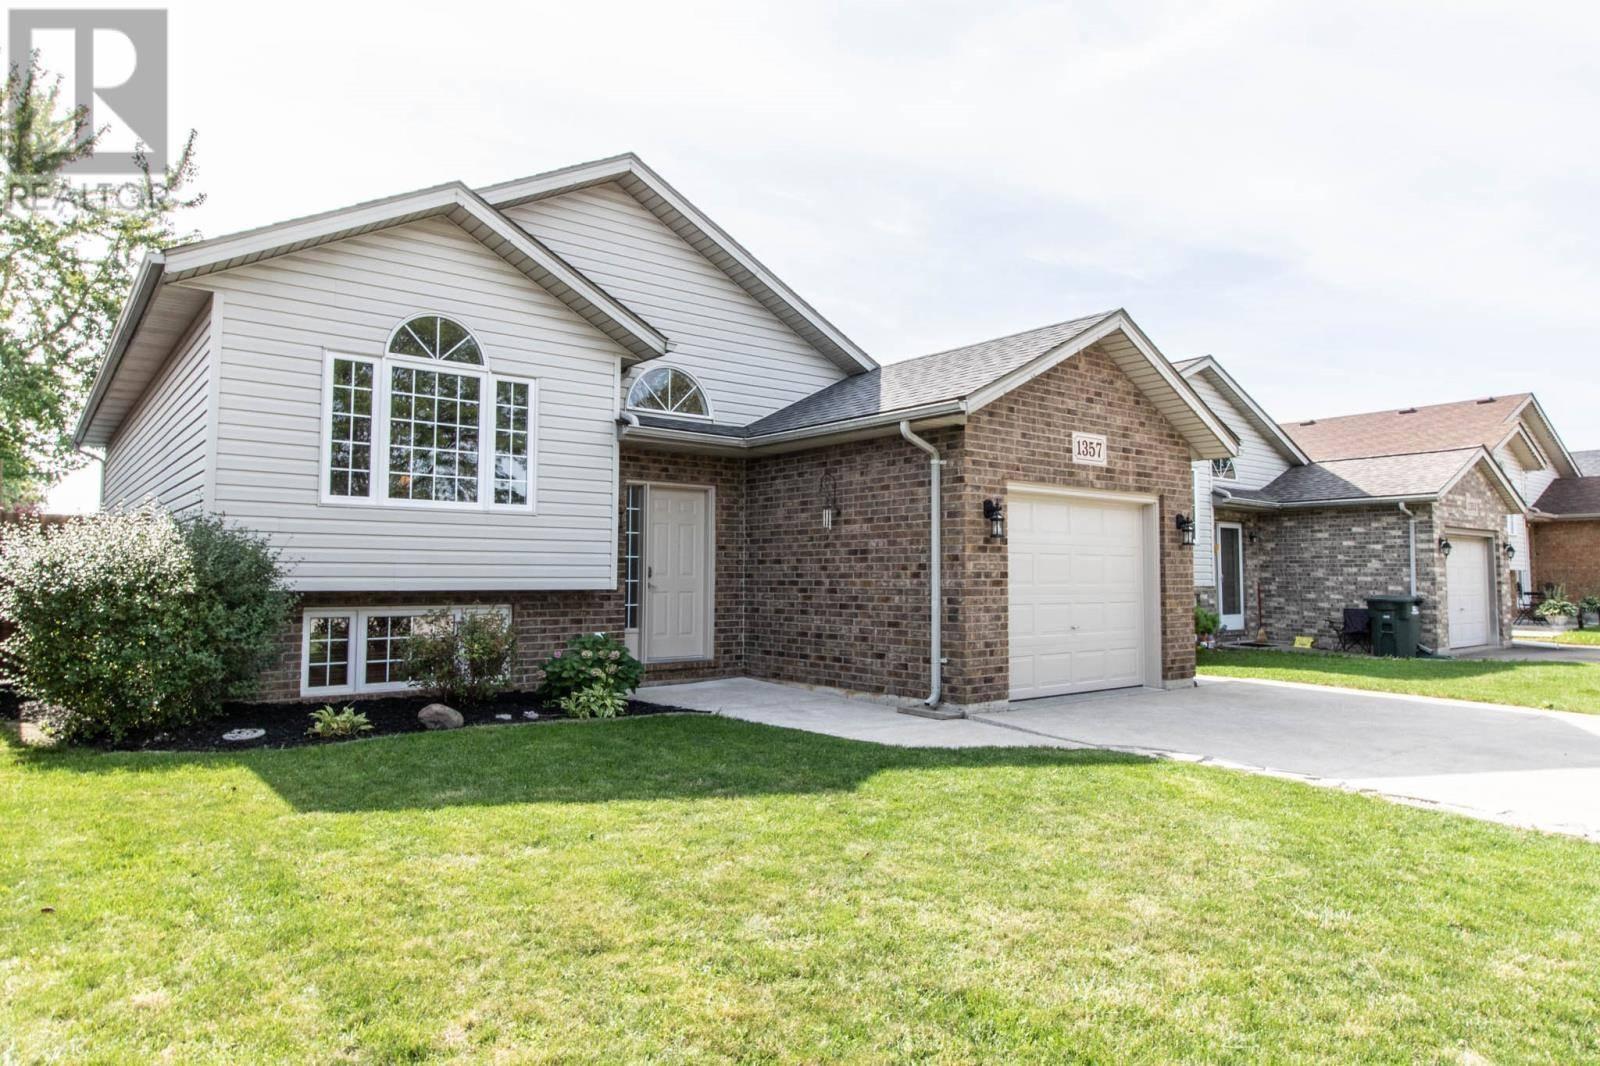 House for sale at 1357 Jessop  Windsor Ontario - MLS: 19025416